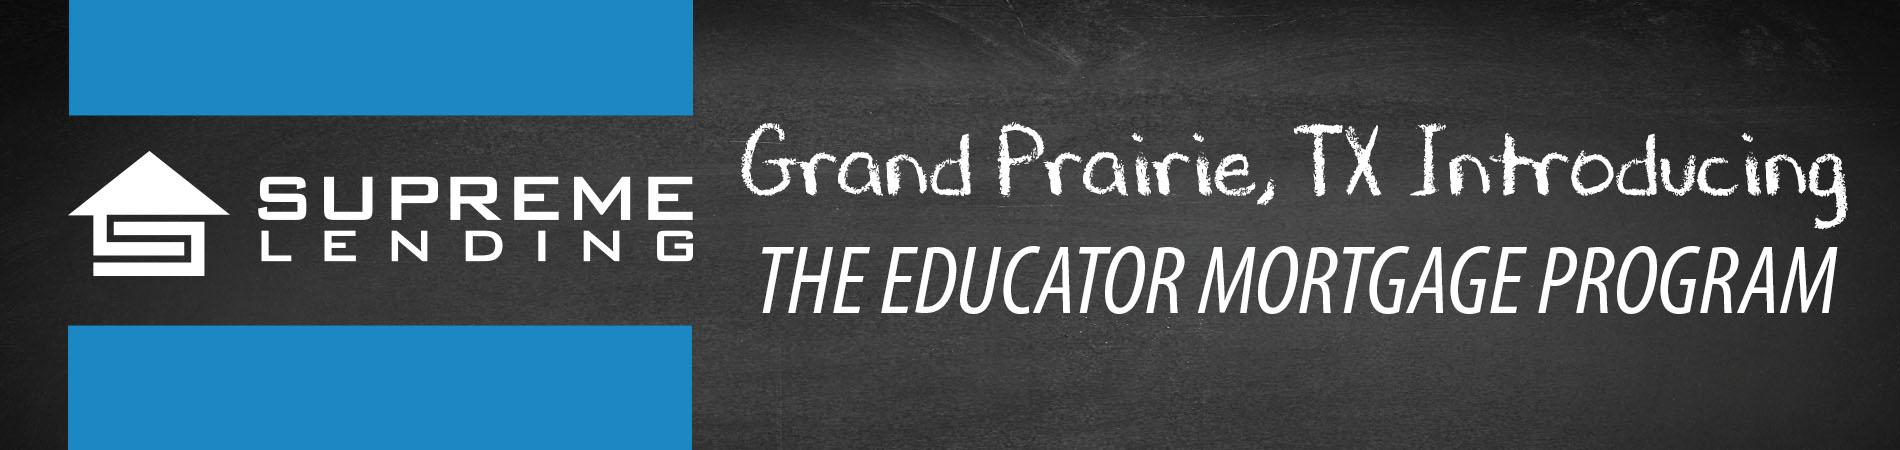 Educator Mortgage Program Grand Prairie TX